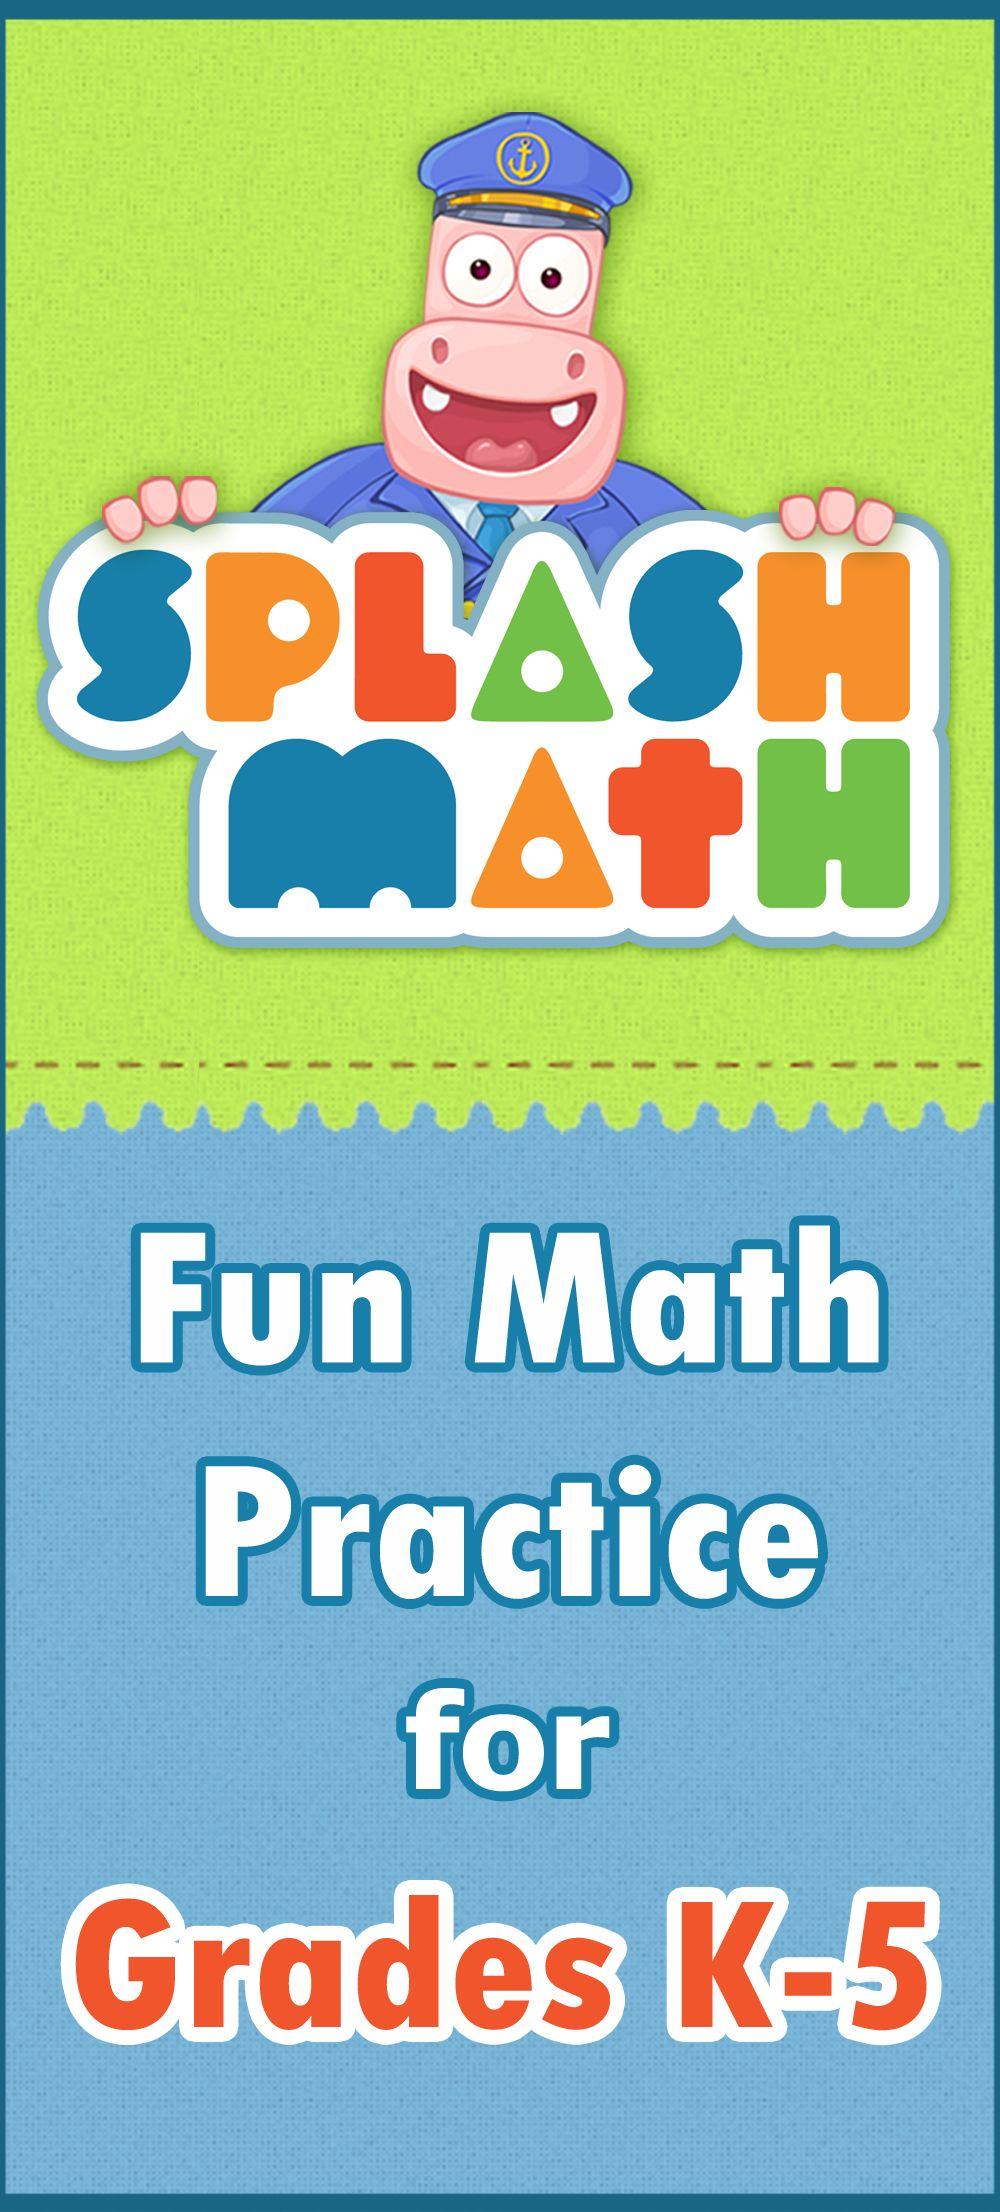 Splash Math Fun Math Practice For Grades 1 5 Splash Math Fun Math Math Practices Math Practice Games [ 2212 x 1000 Pixel ]